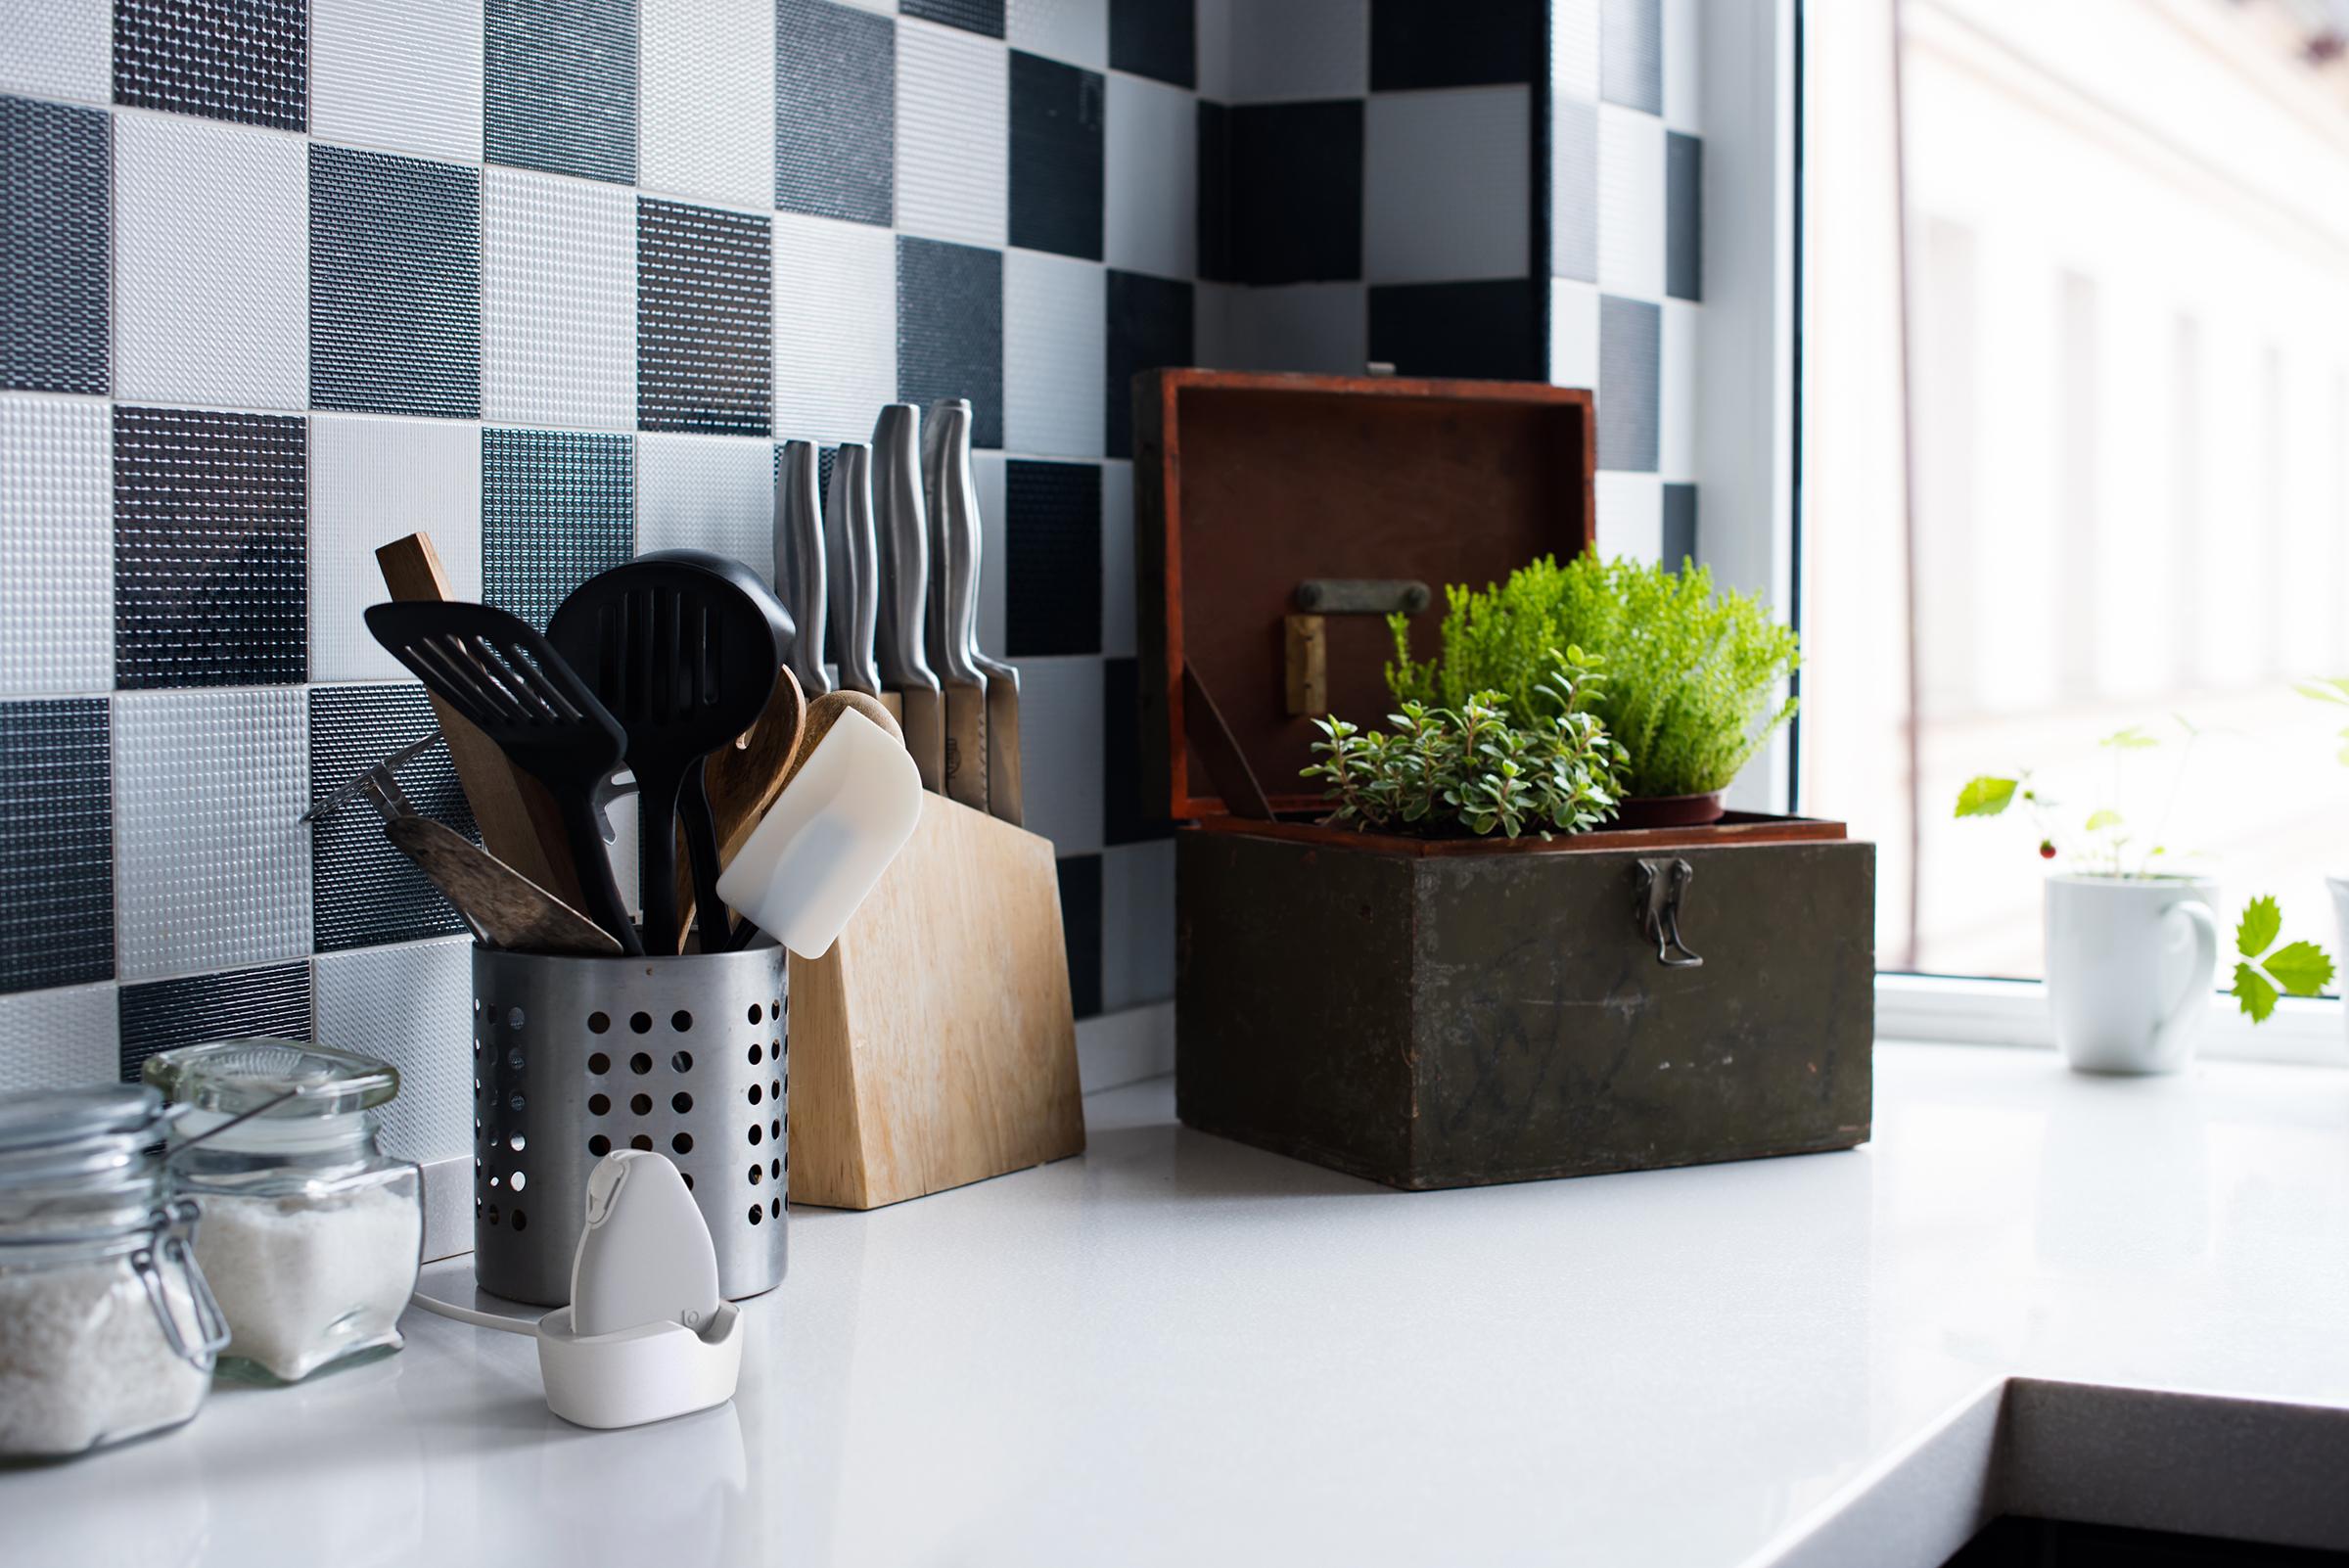 Jiobit on a kitchen counter